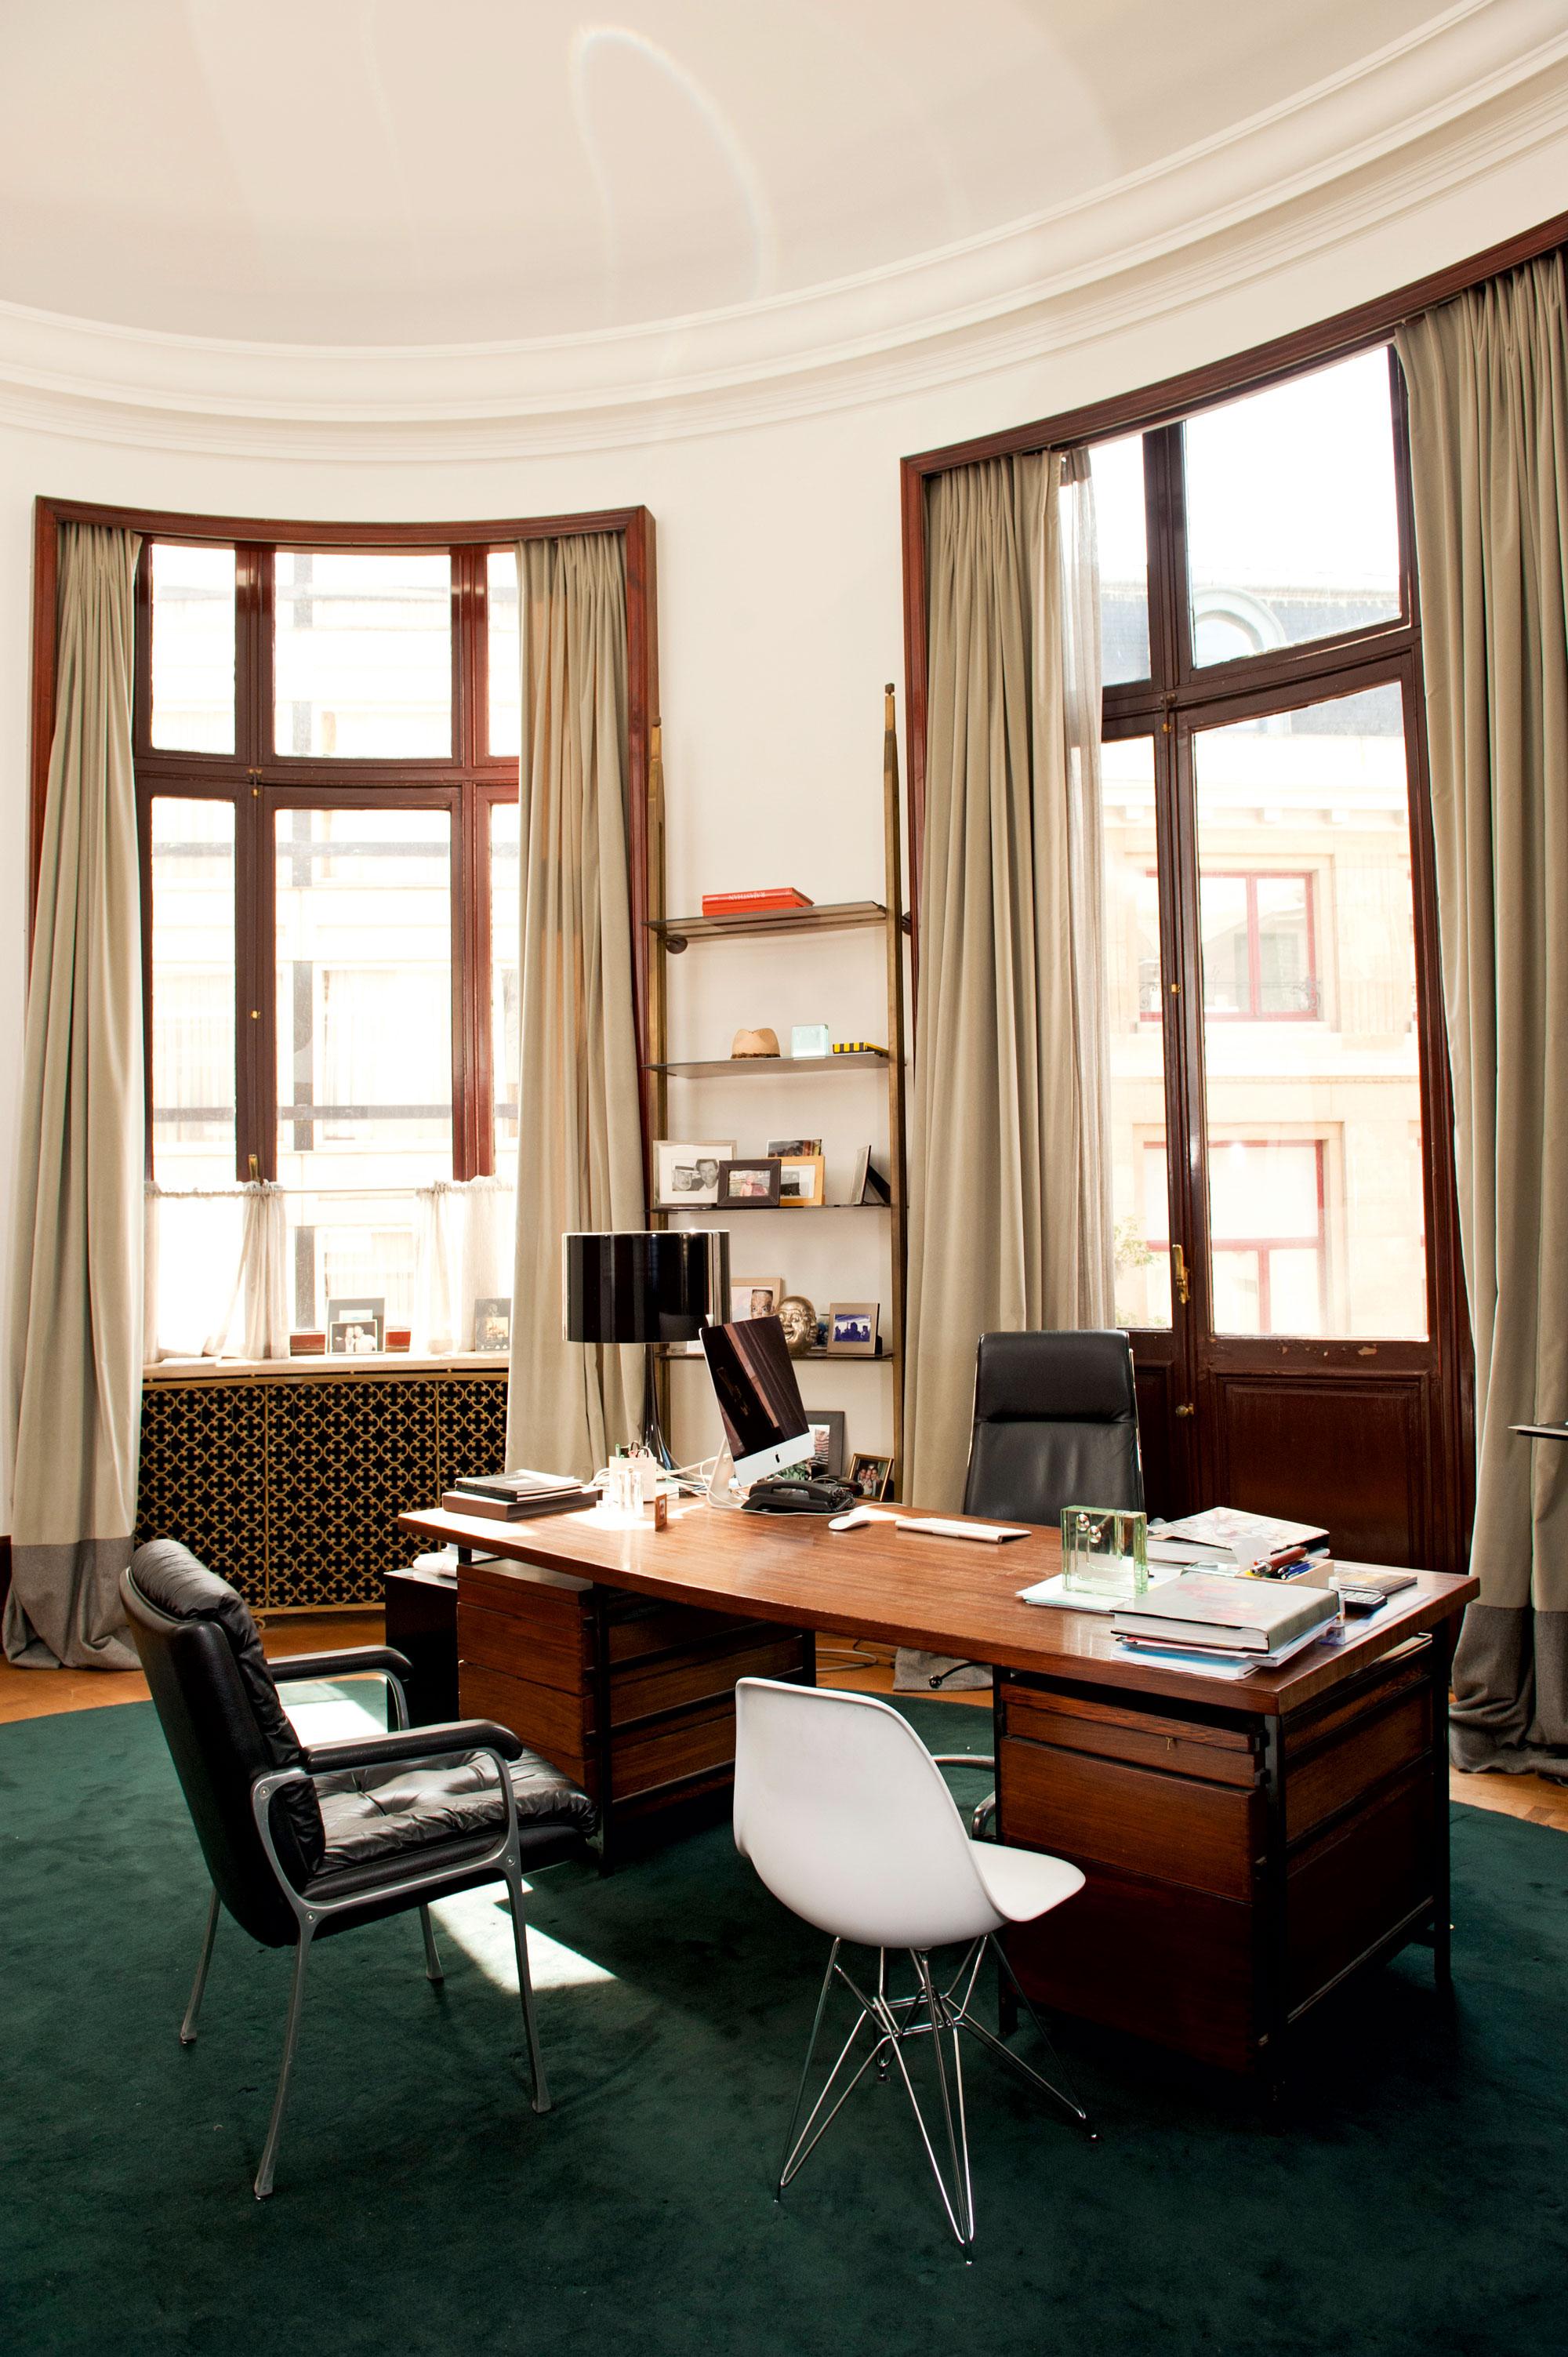 Esfans 'oval office': clean, licht en luchtig